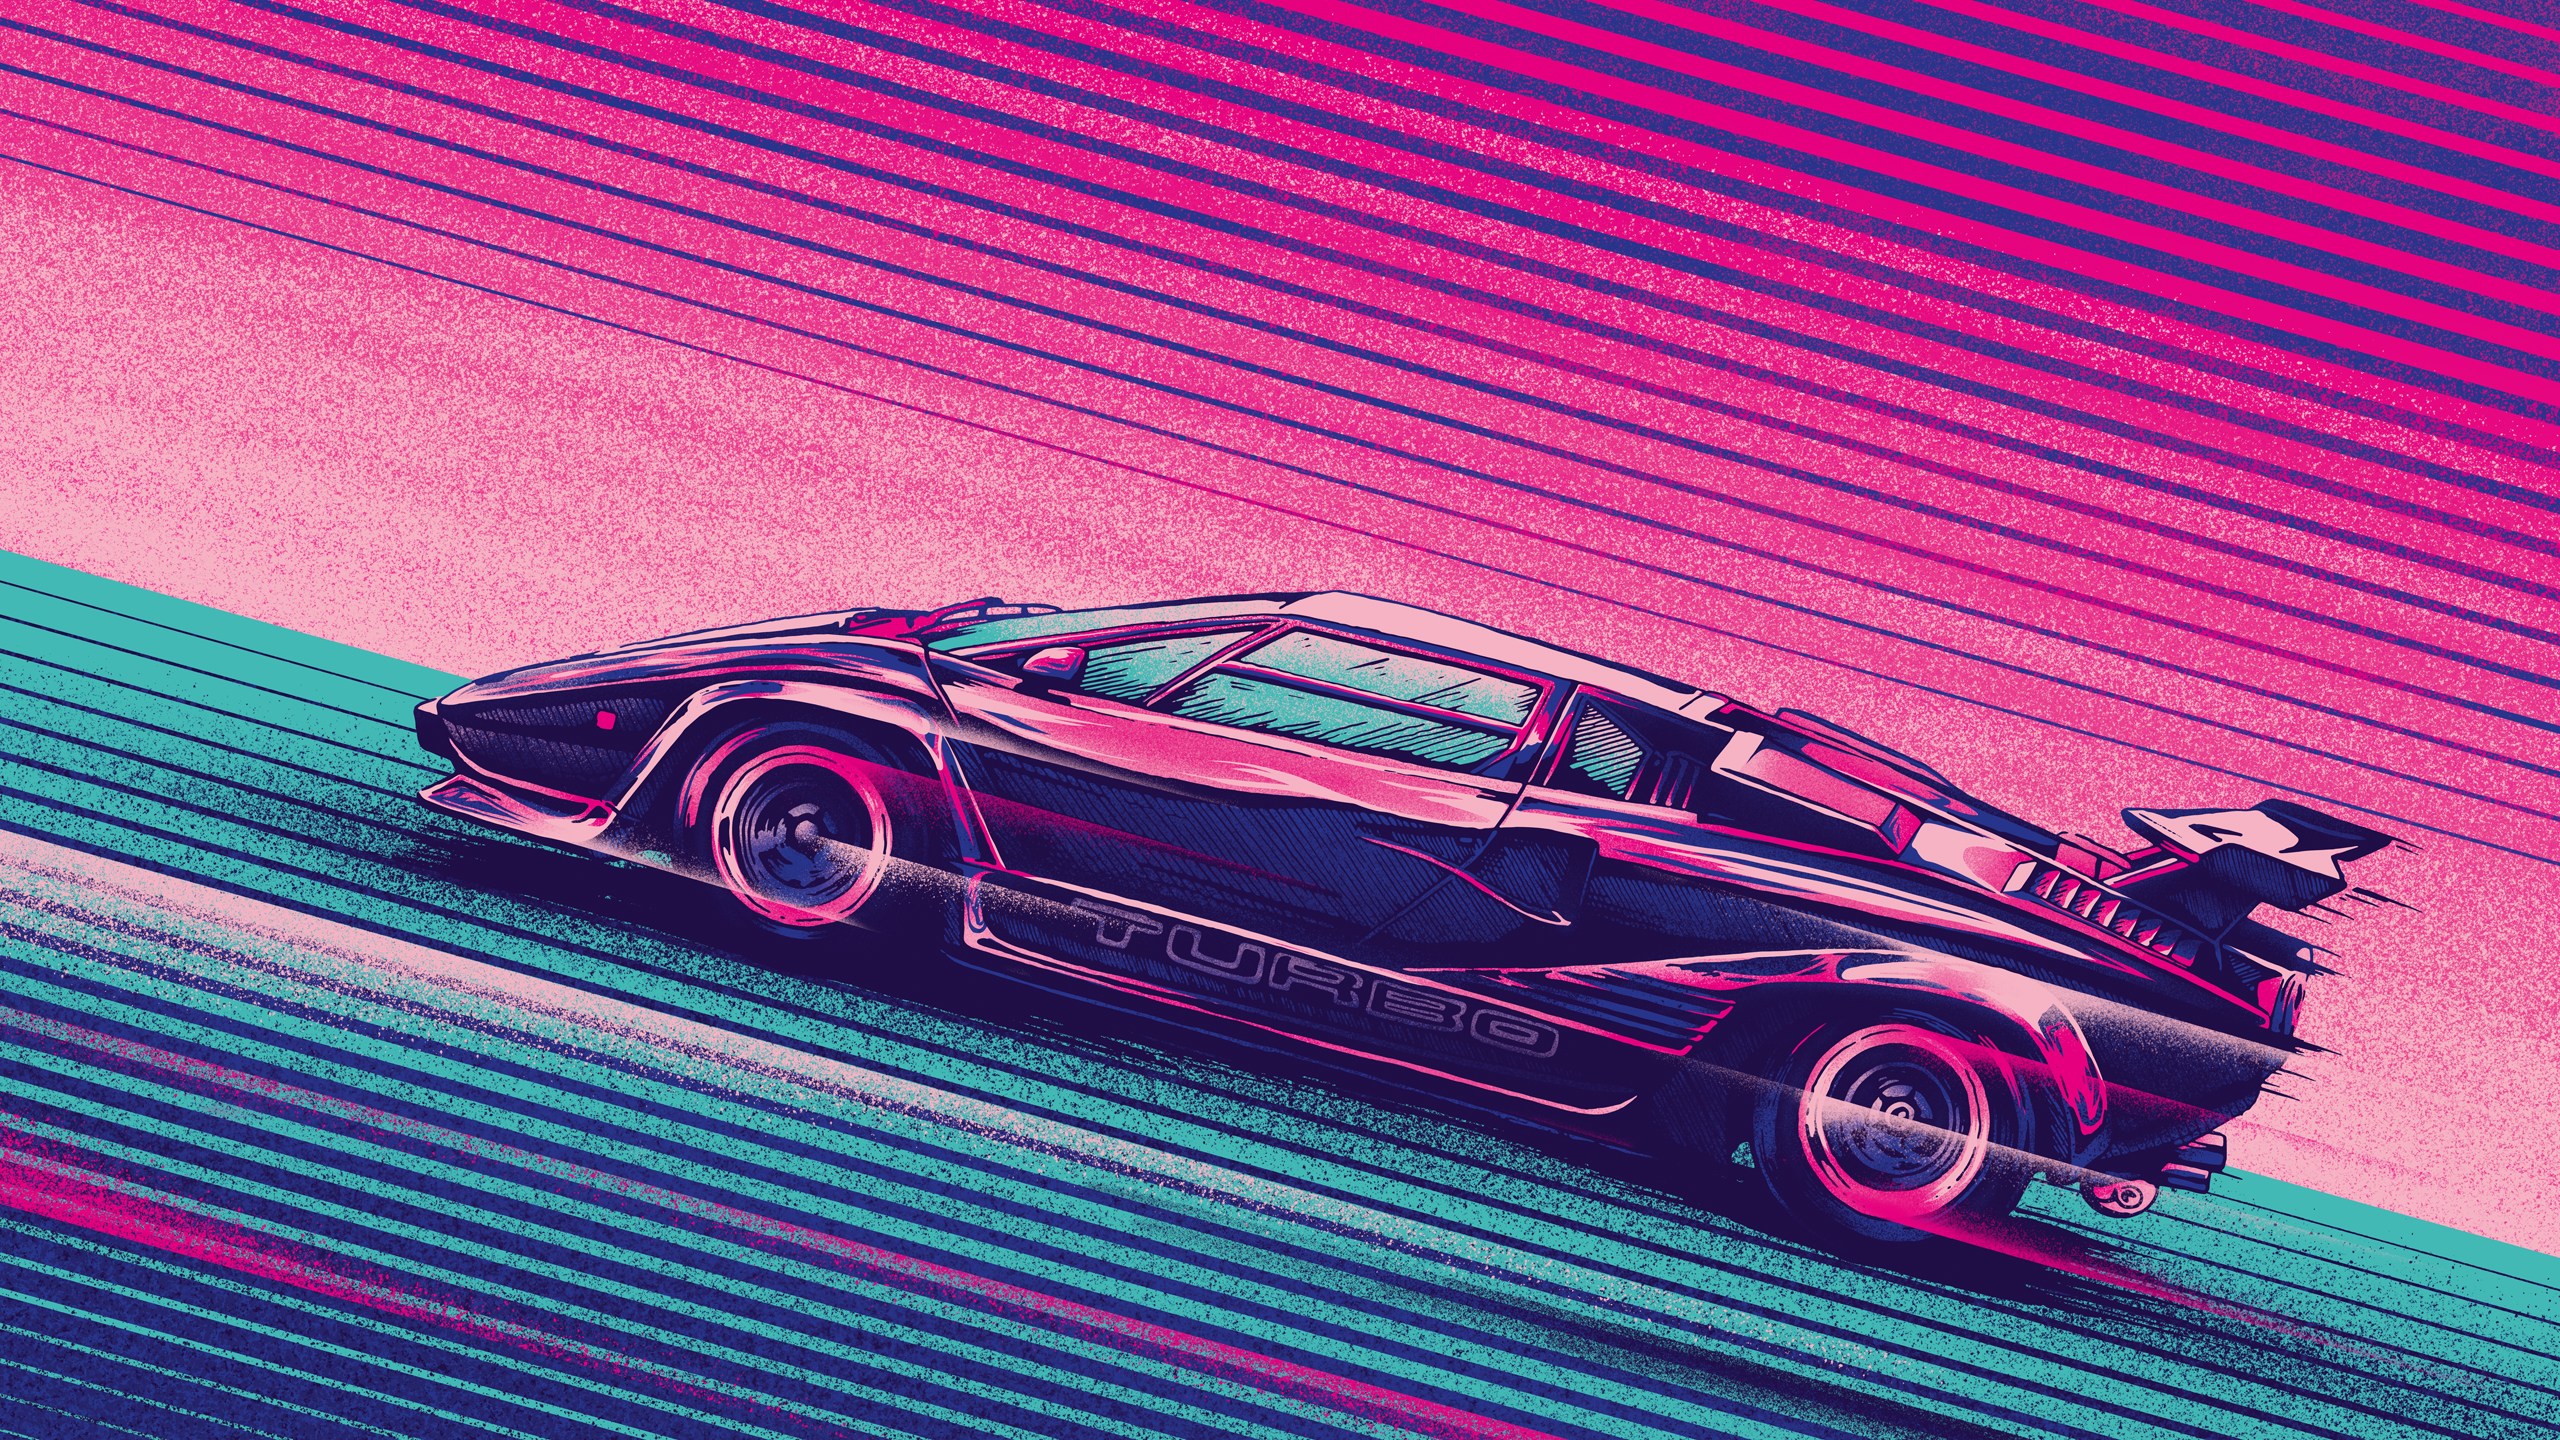 Free download Lamborghini Countach HD Wallpaper Background